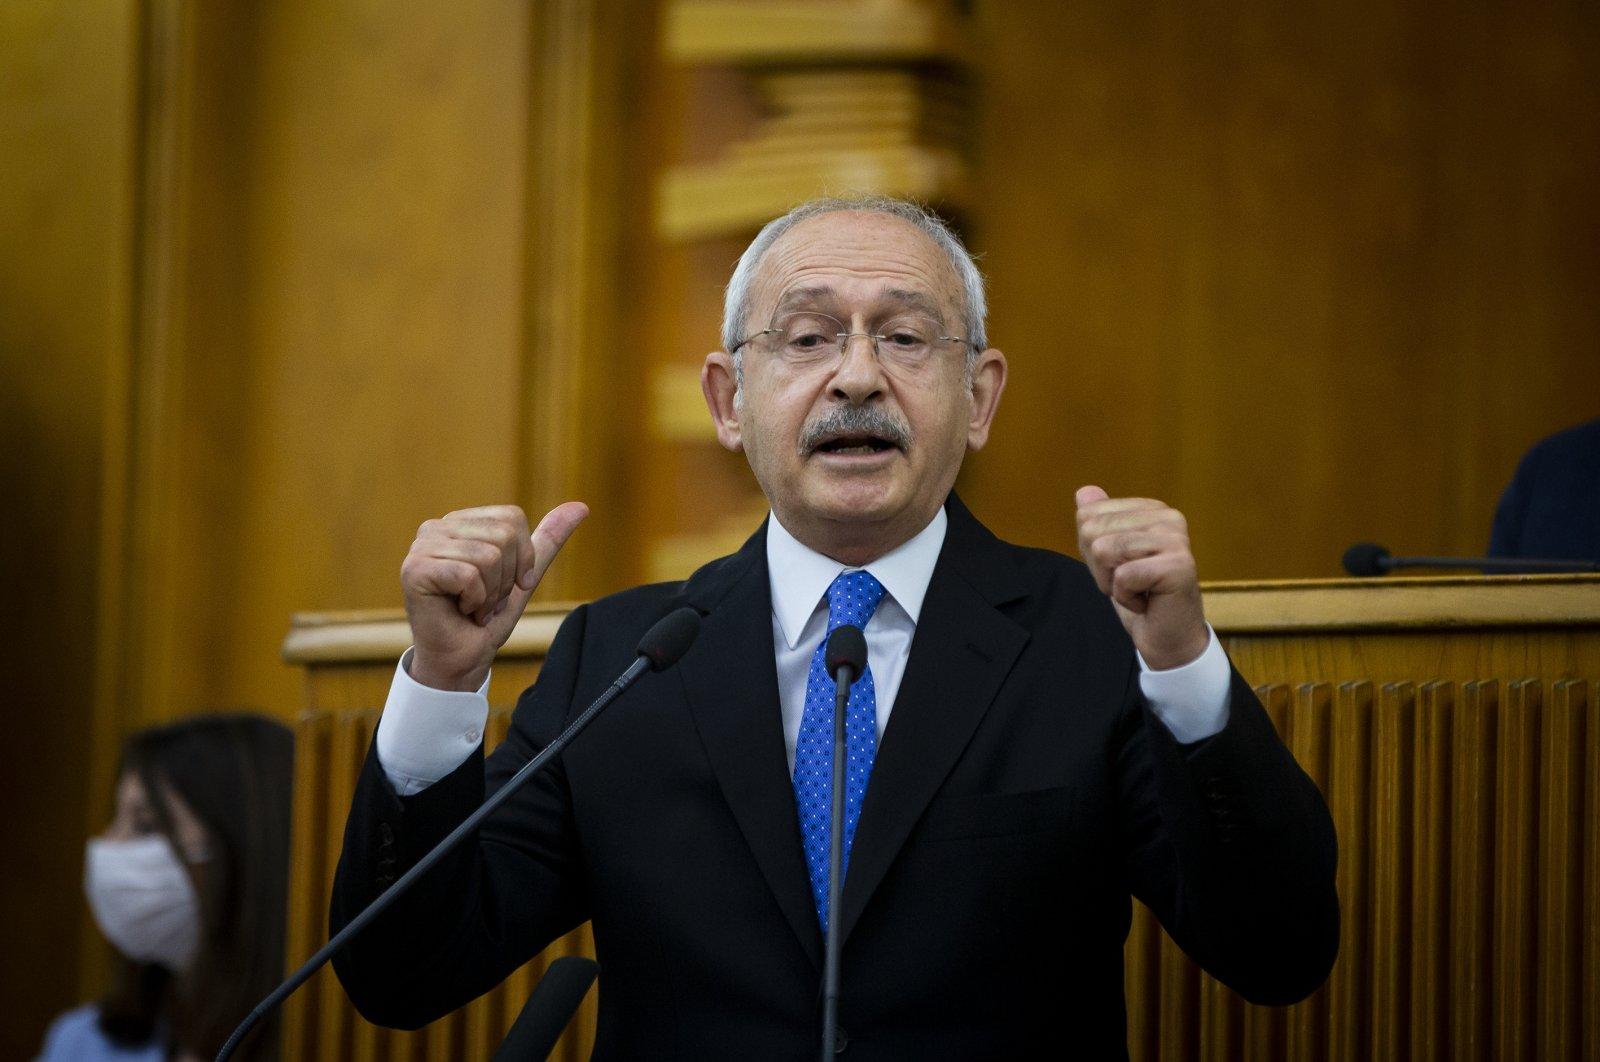 Republican People's Party (CHP) Chairman Kemal Kılıçdaroğlu attends his party's group meeting, Ankara, Turkey, July 21, 2020. (AA Photo)